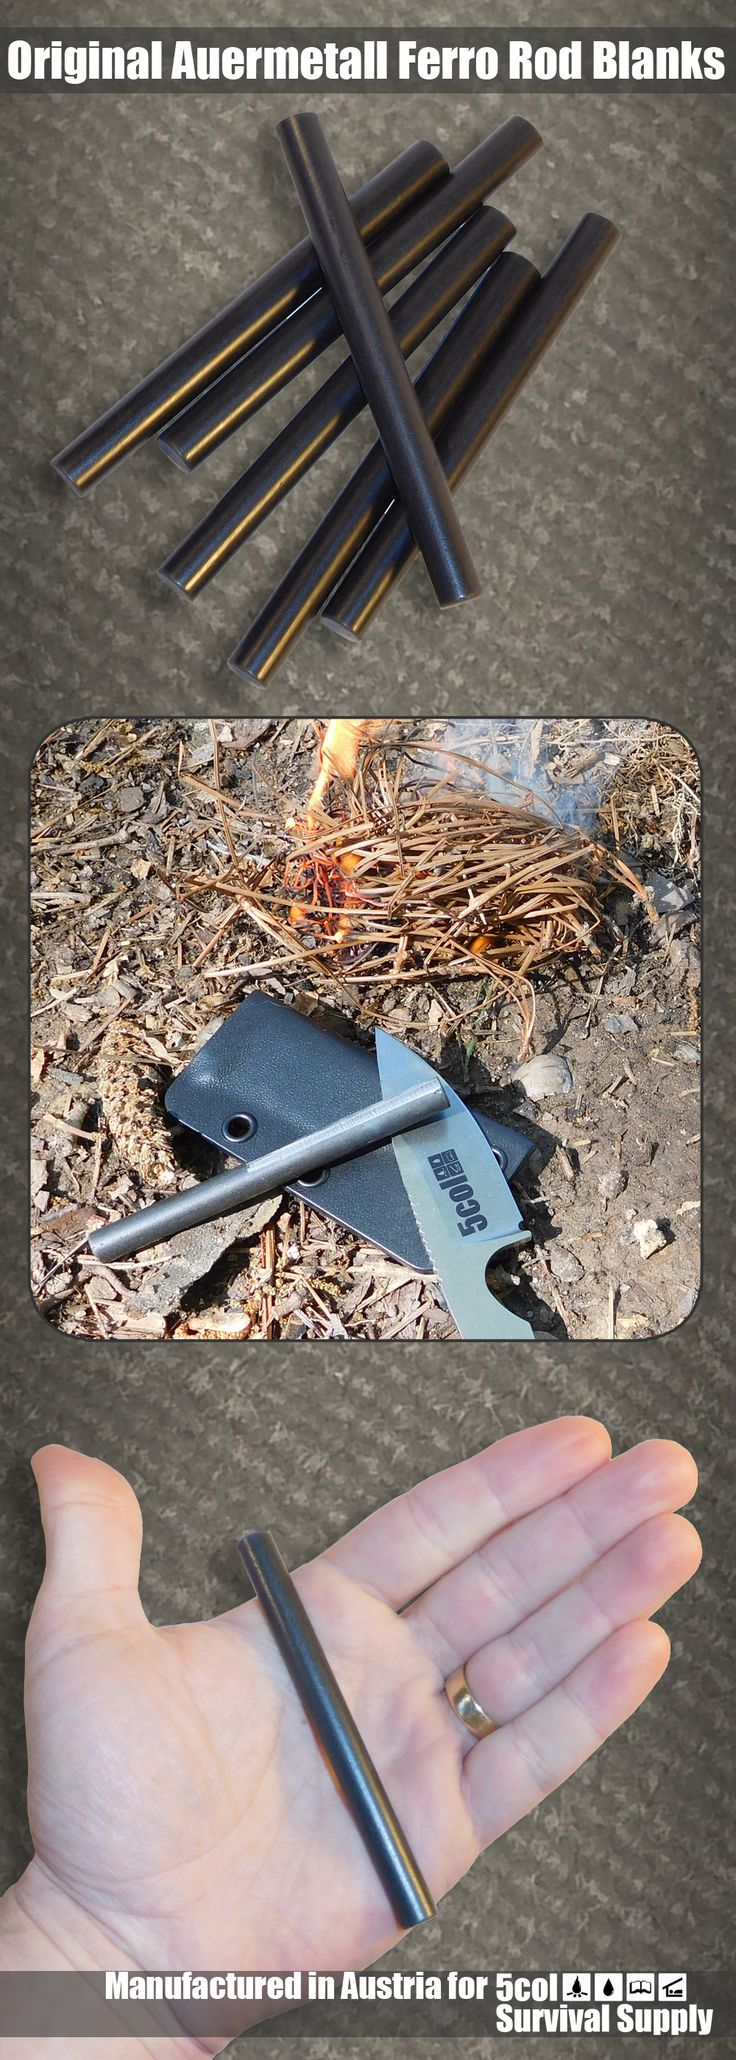 Original Auermetall Ferro Rod Blanks, manufactured in Austria by Treibacher for 5col Survival Supply